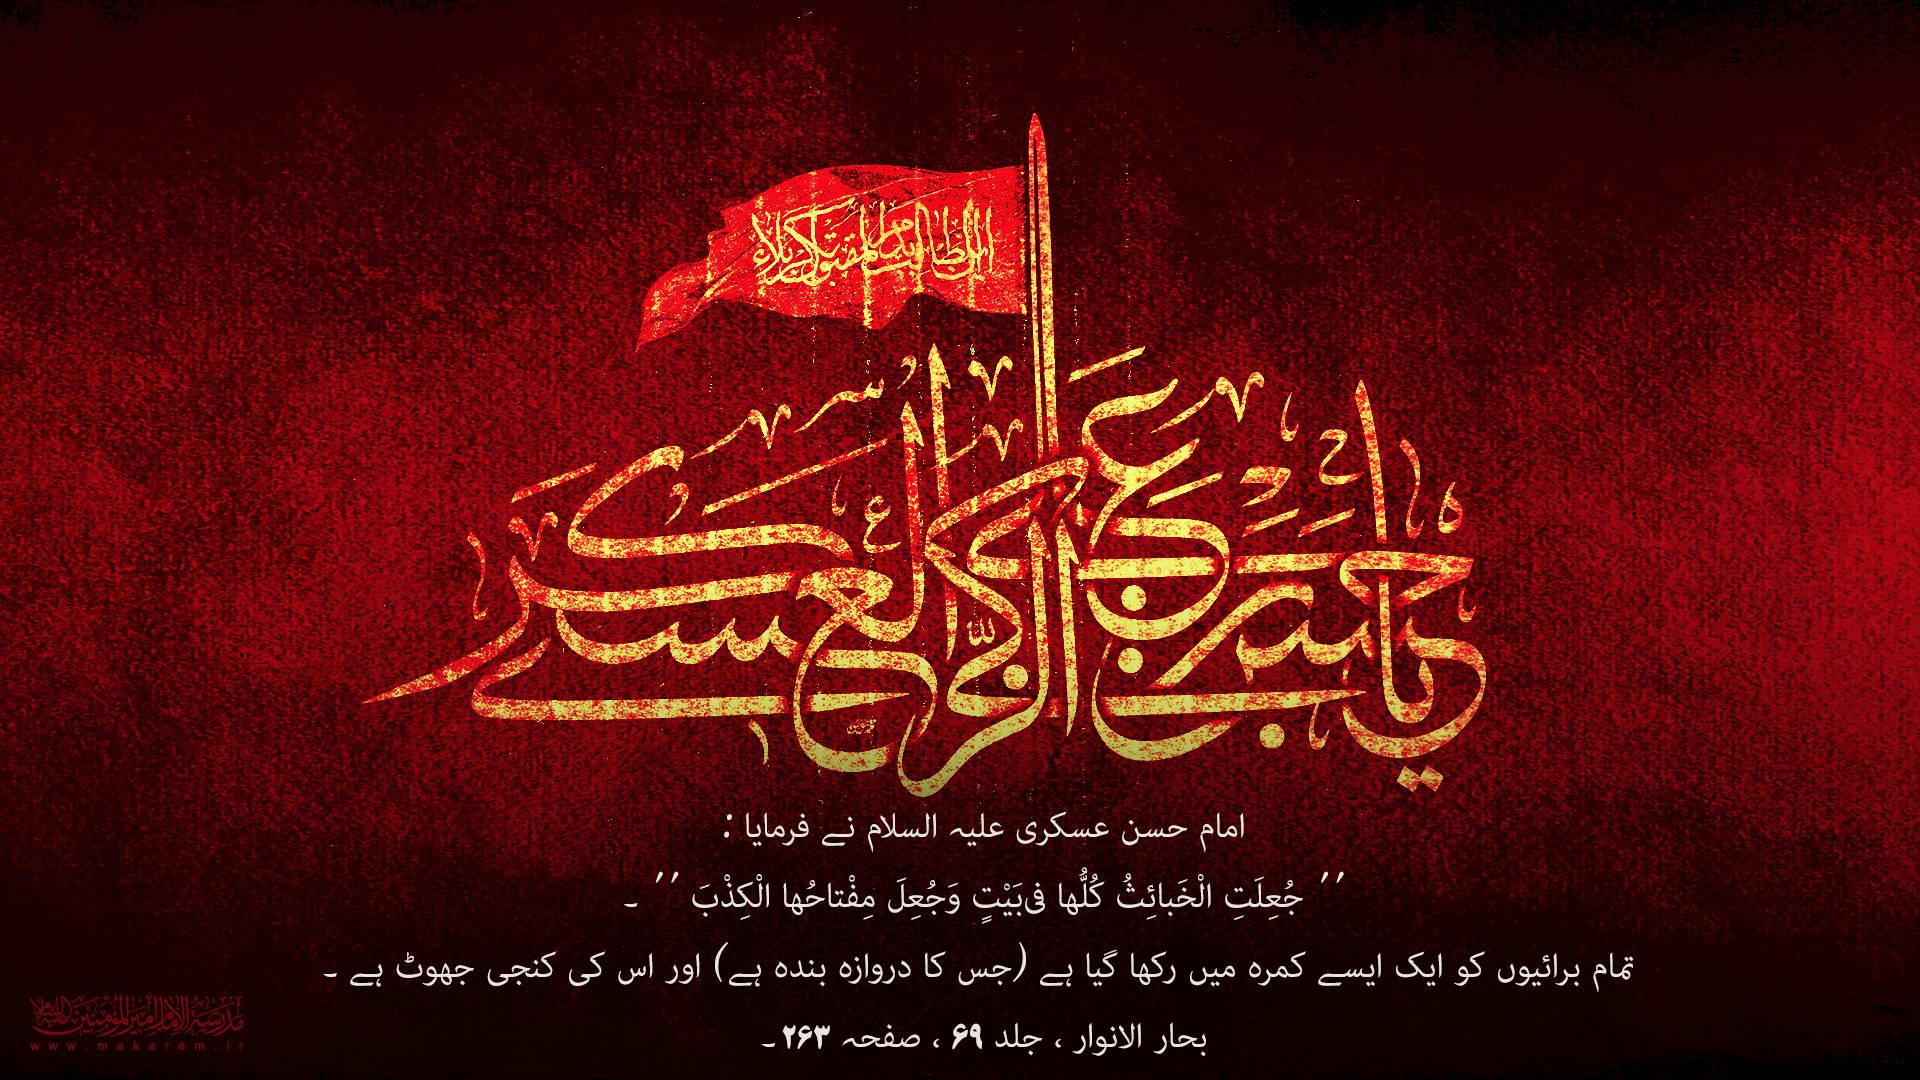 شهادت امام حسن عسکری(ع)-مدرسه الامام امیر المومنین (ع)